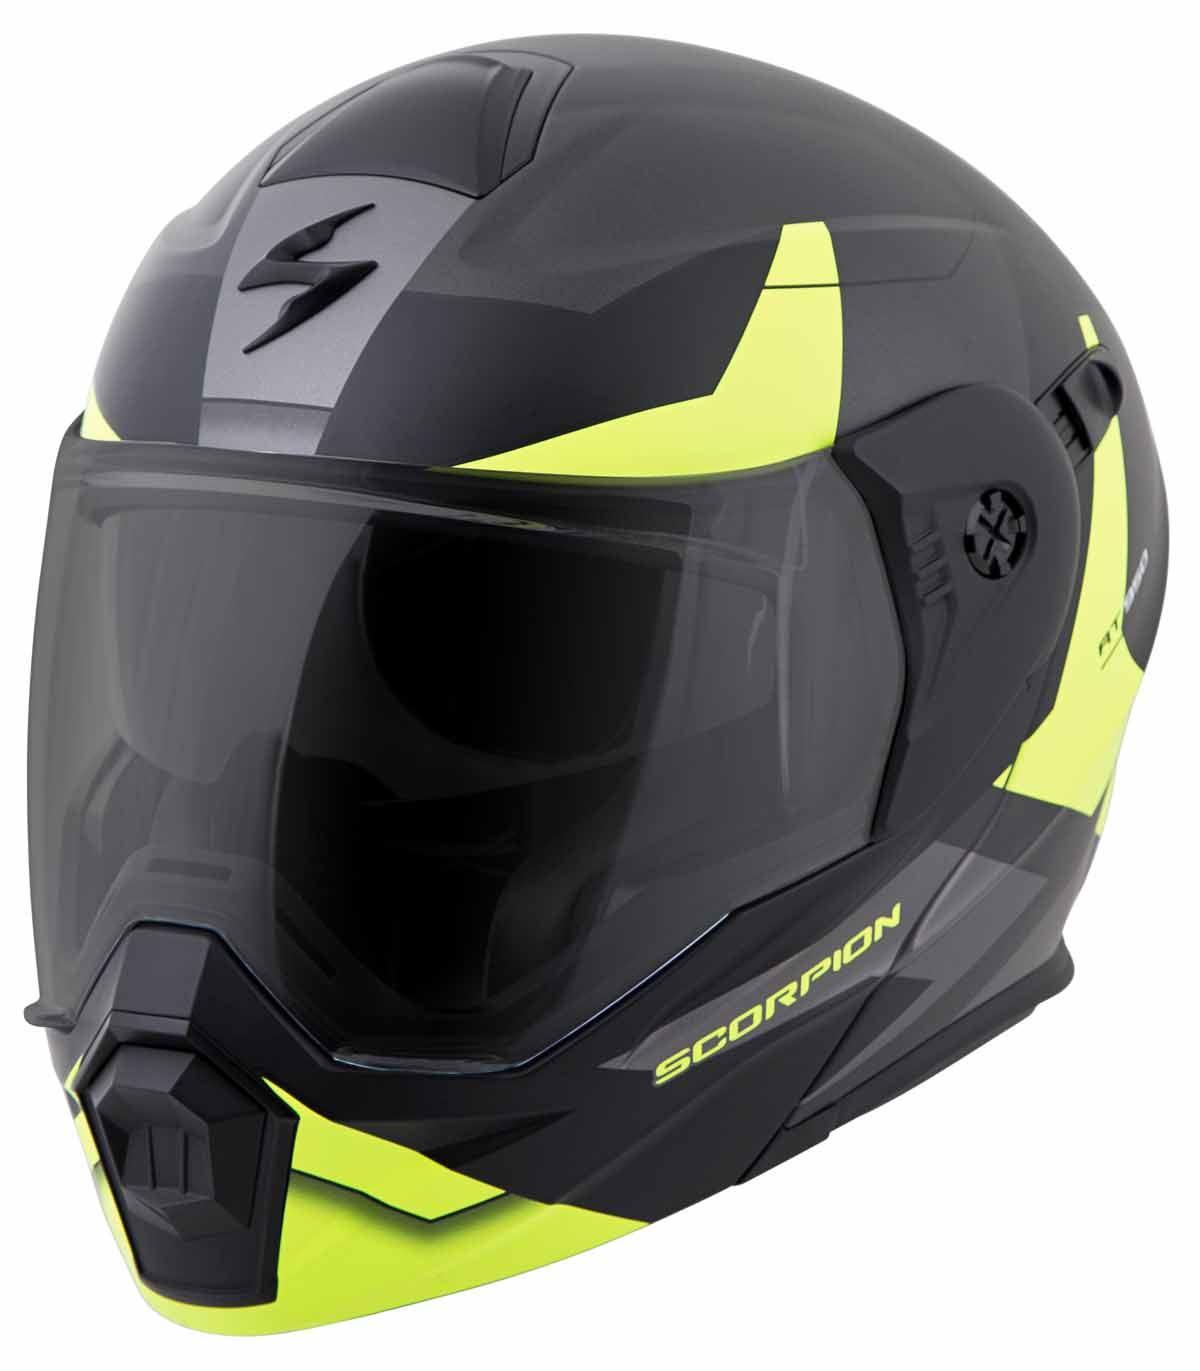 Scorpion-EXO-AT950-Helmet-Flip-Up-Modular-Dual-Sport-Adventure-ADV-DOT-XS-3XL miniature 35